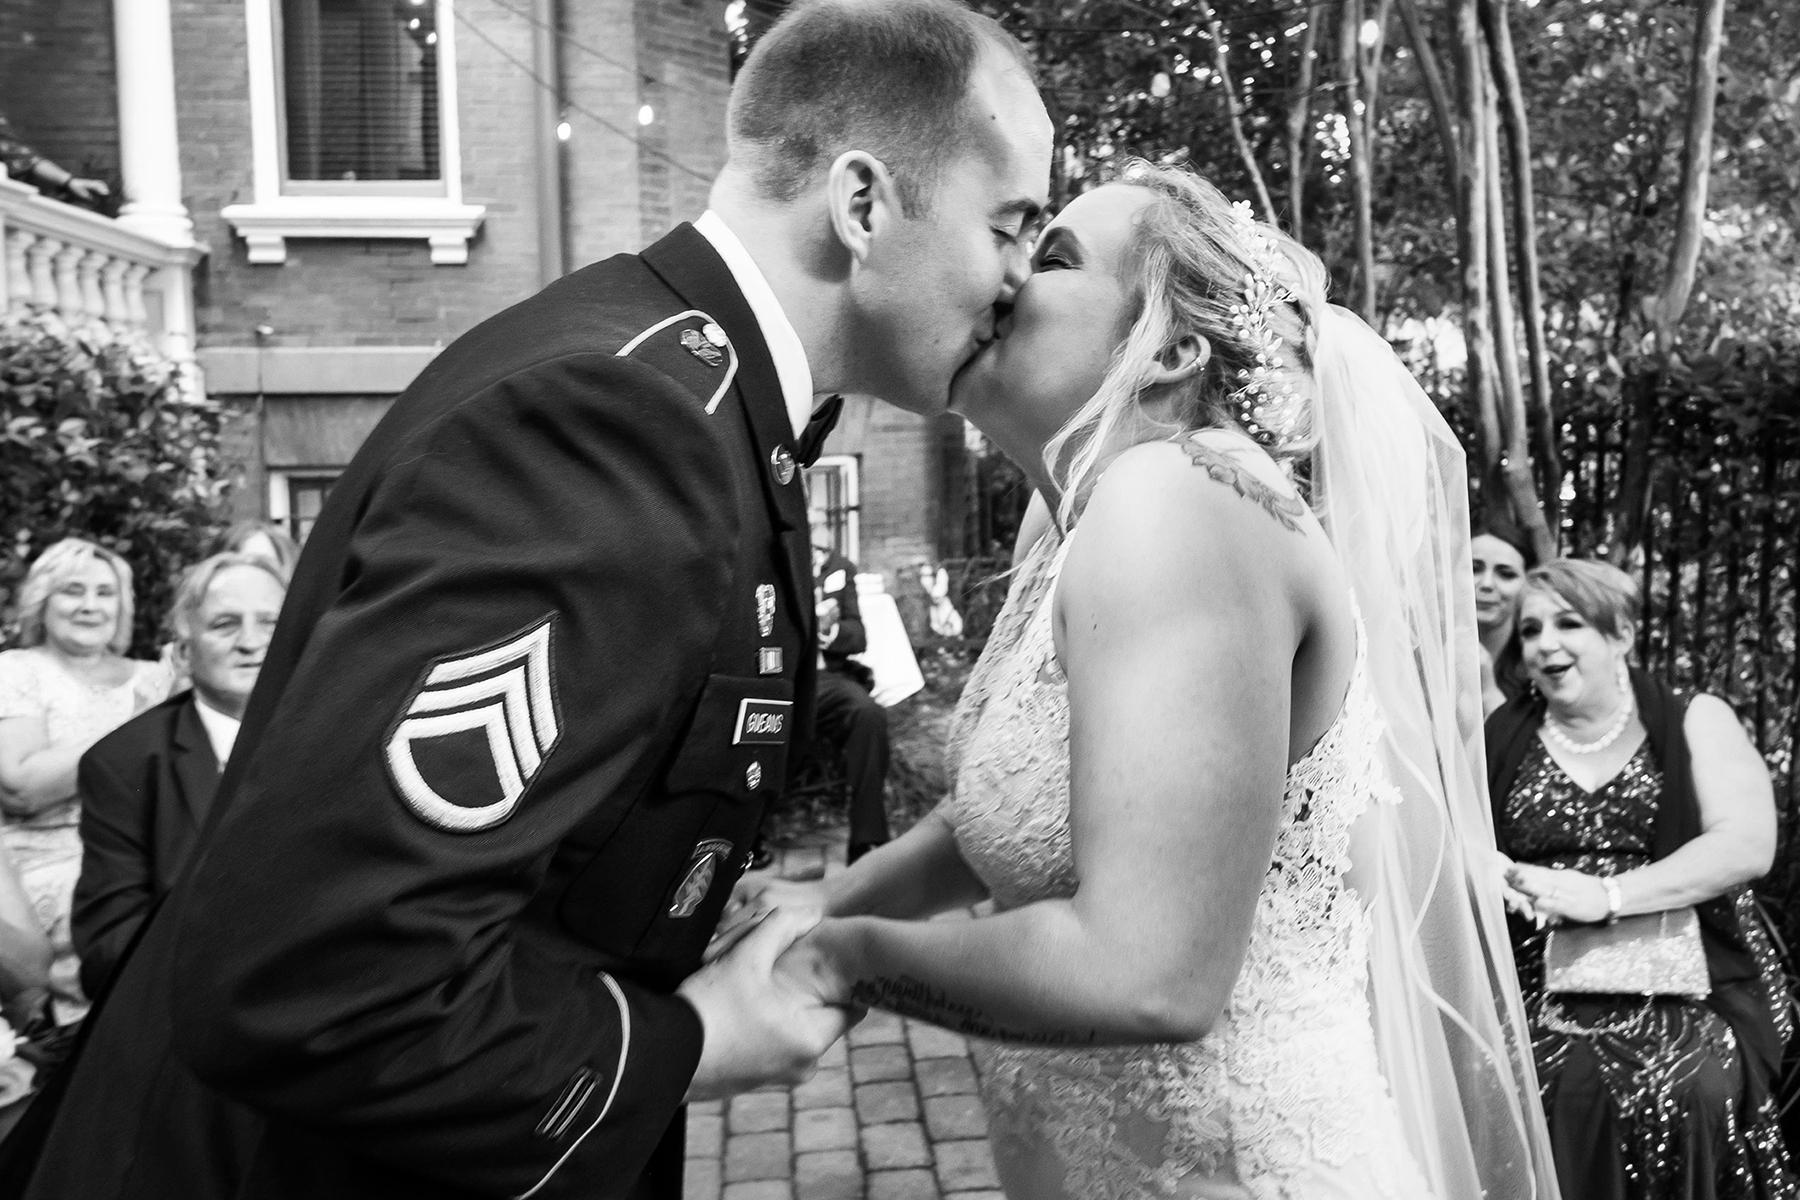 Wedding Ceremony Photography in Savannah, GA | The traditional kiss